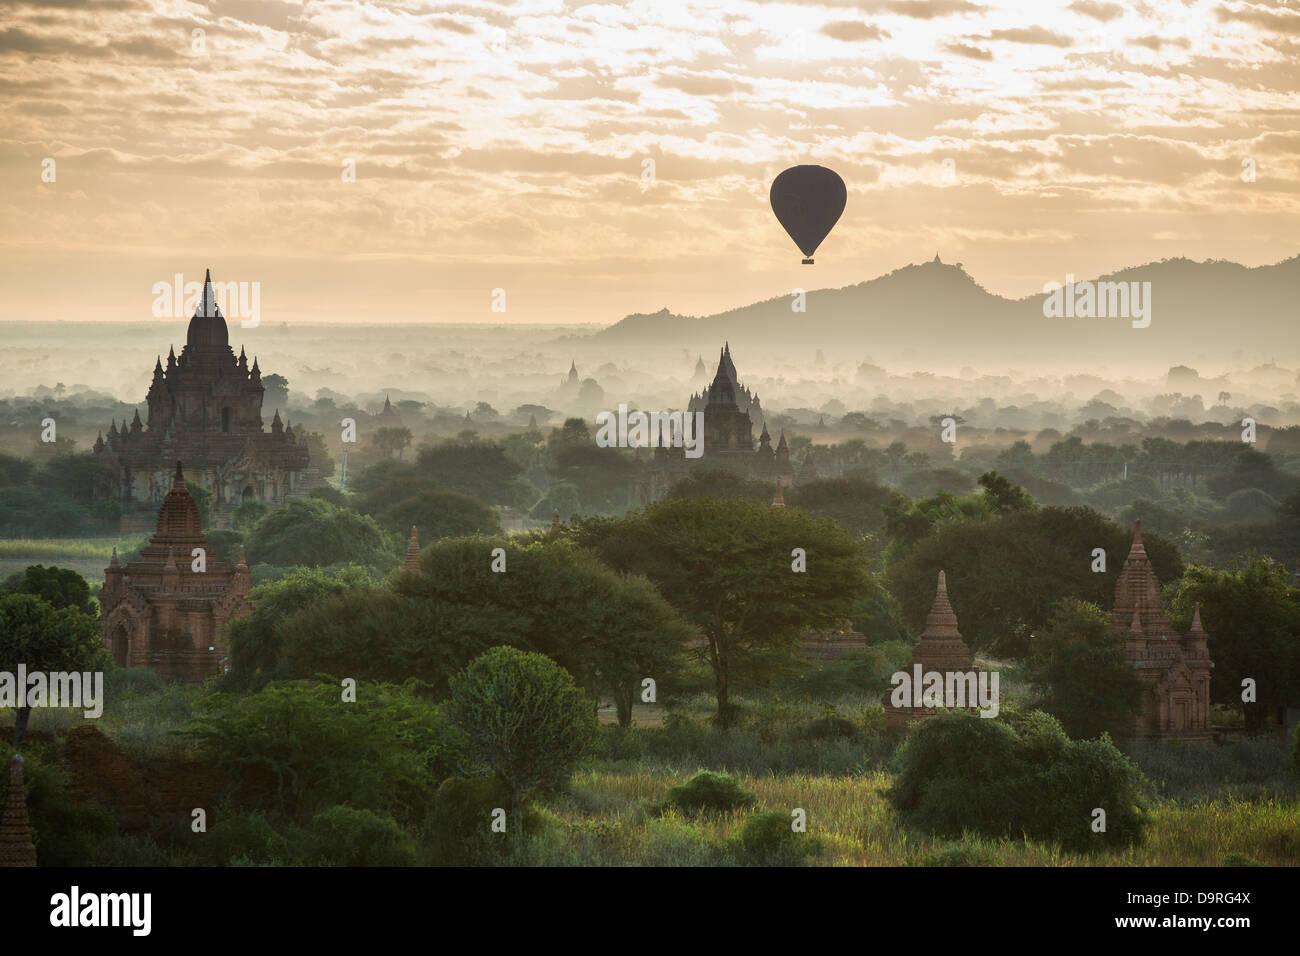 balloons over the Temples of Bagan at dawn, Myanmar (Burma) Stock Photo